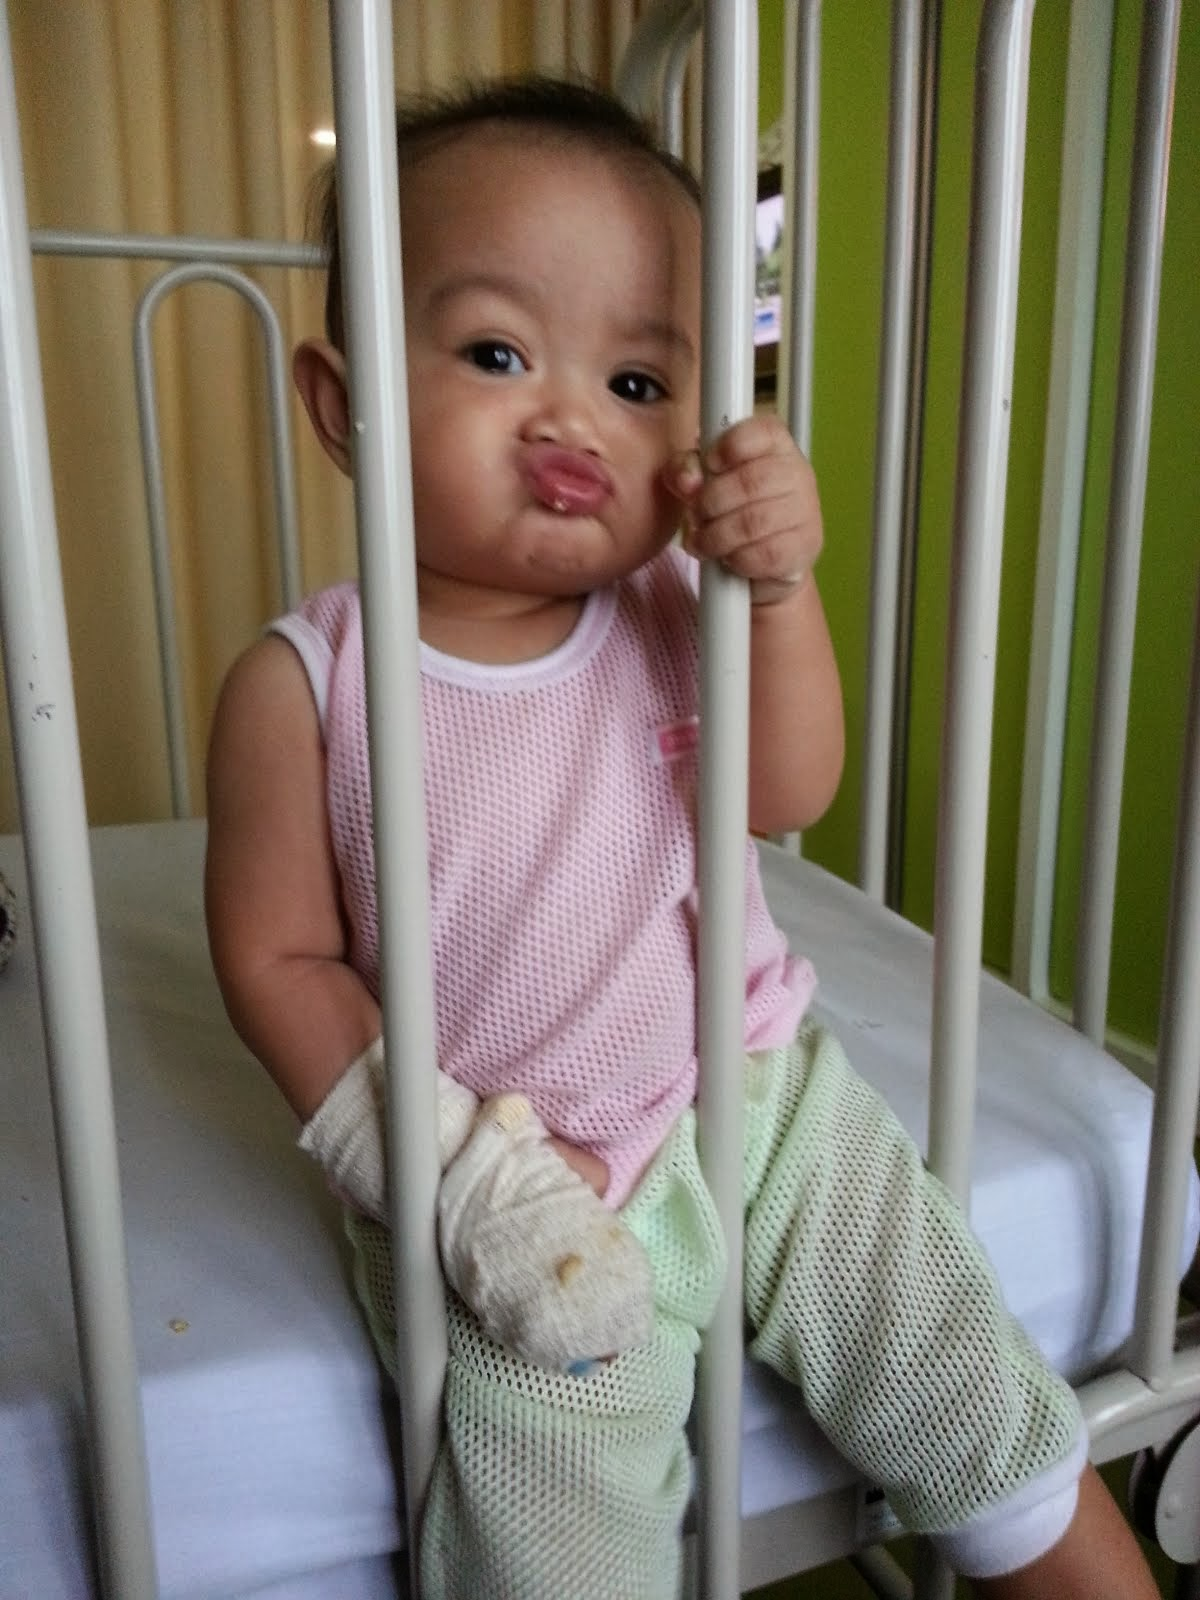 Dhia Batrisyia - 9 month